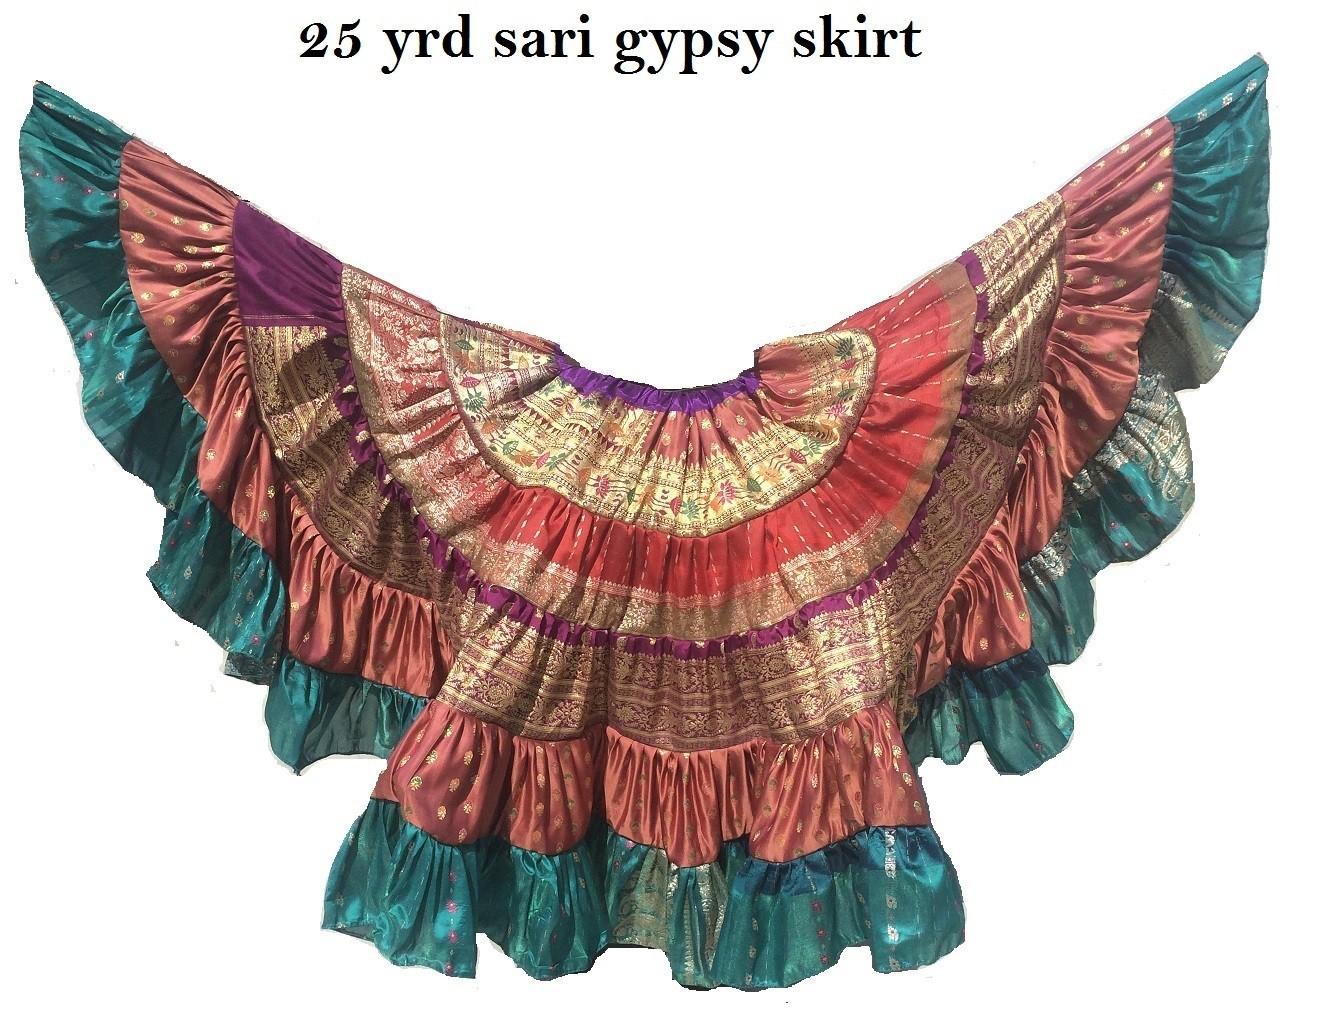 Sales skirt